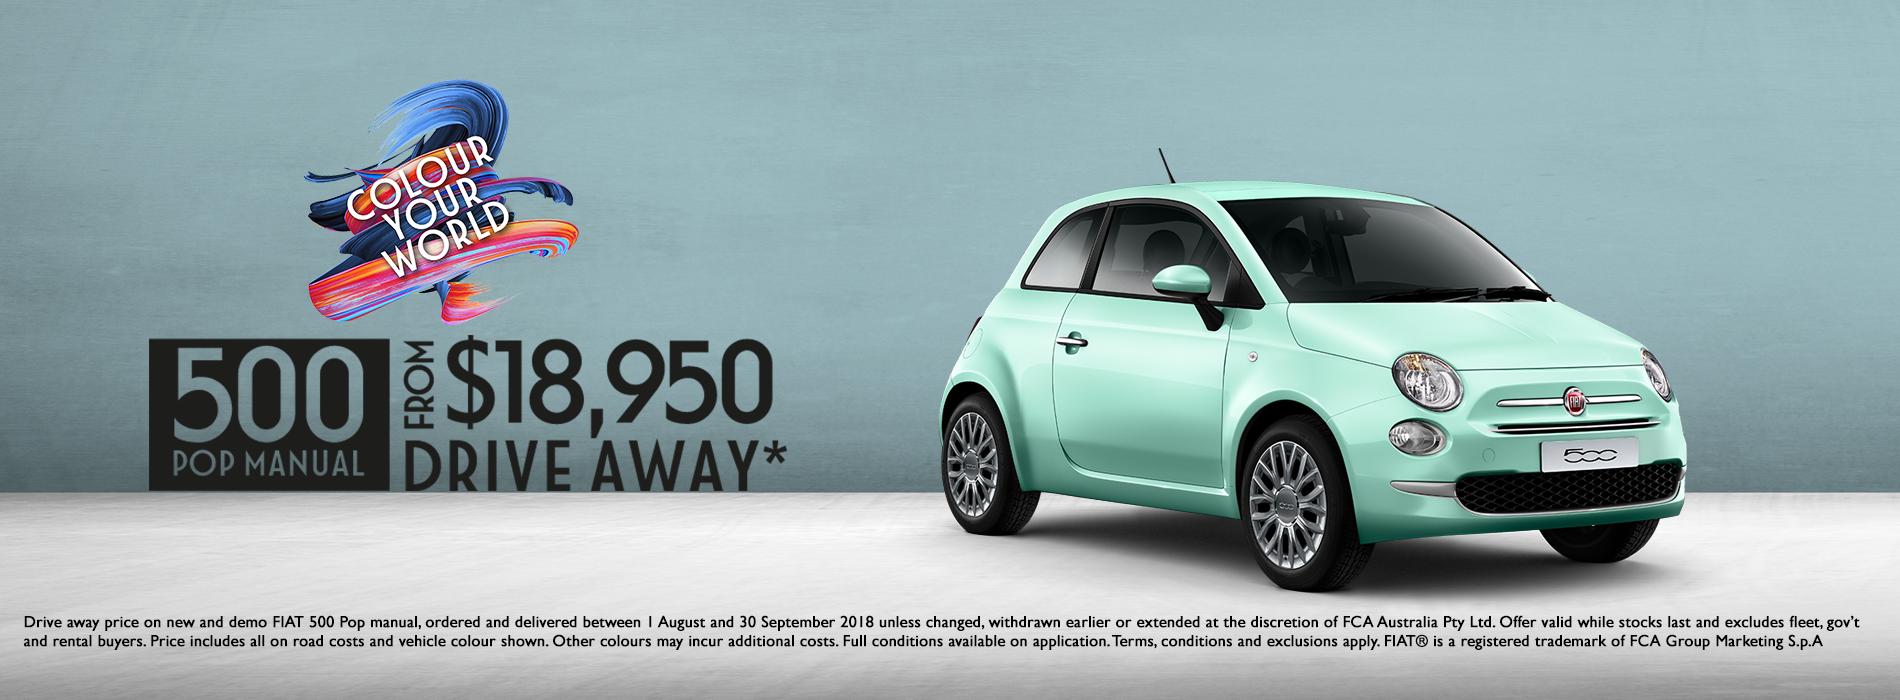 Fiat 500 Offer